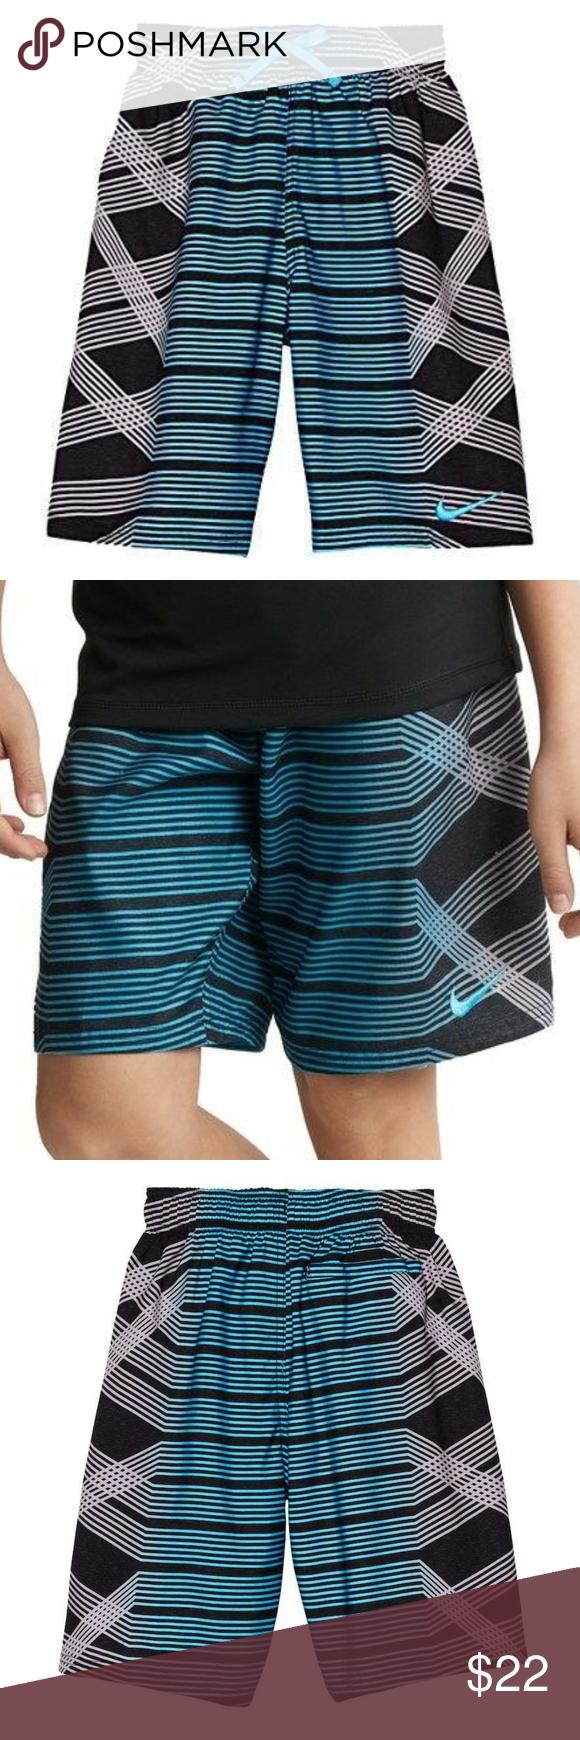 68e0d24acb Nike Boys Spin Breaker Swim Trunks S L Nike Boys Spin Breaker Volley Swim  Trunks NESS8657-430 Blue Black 8